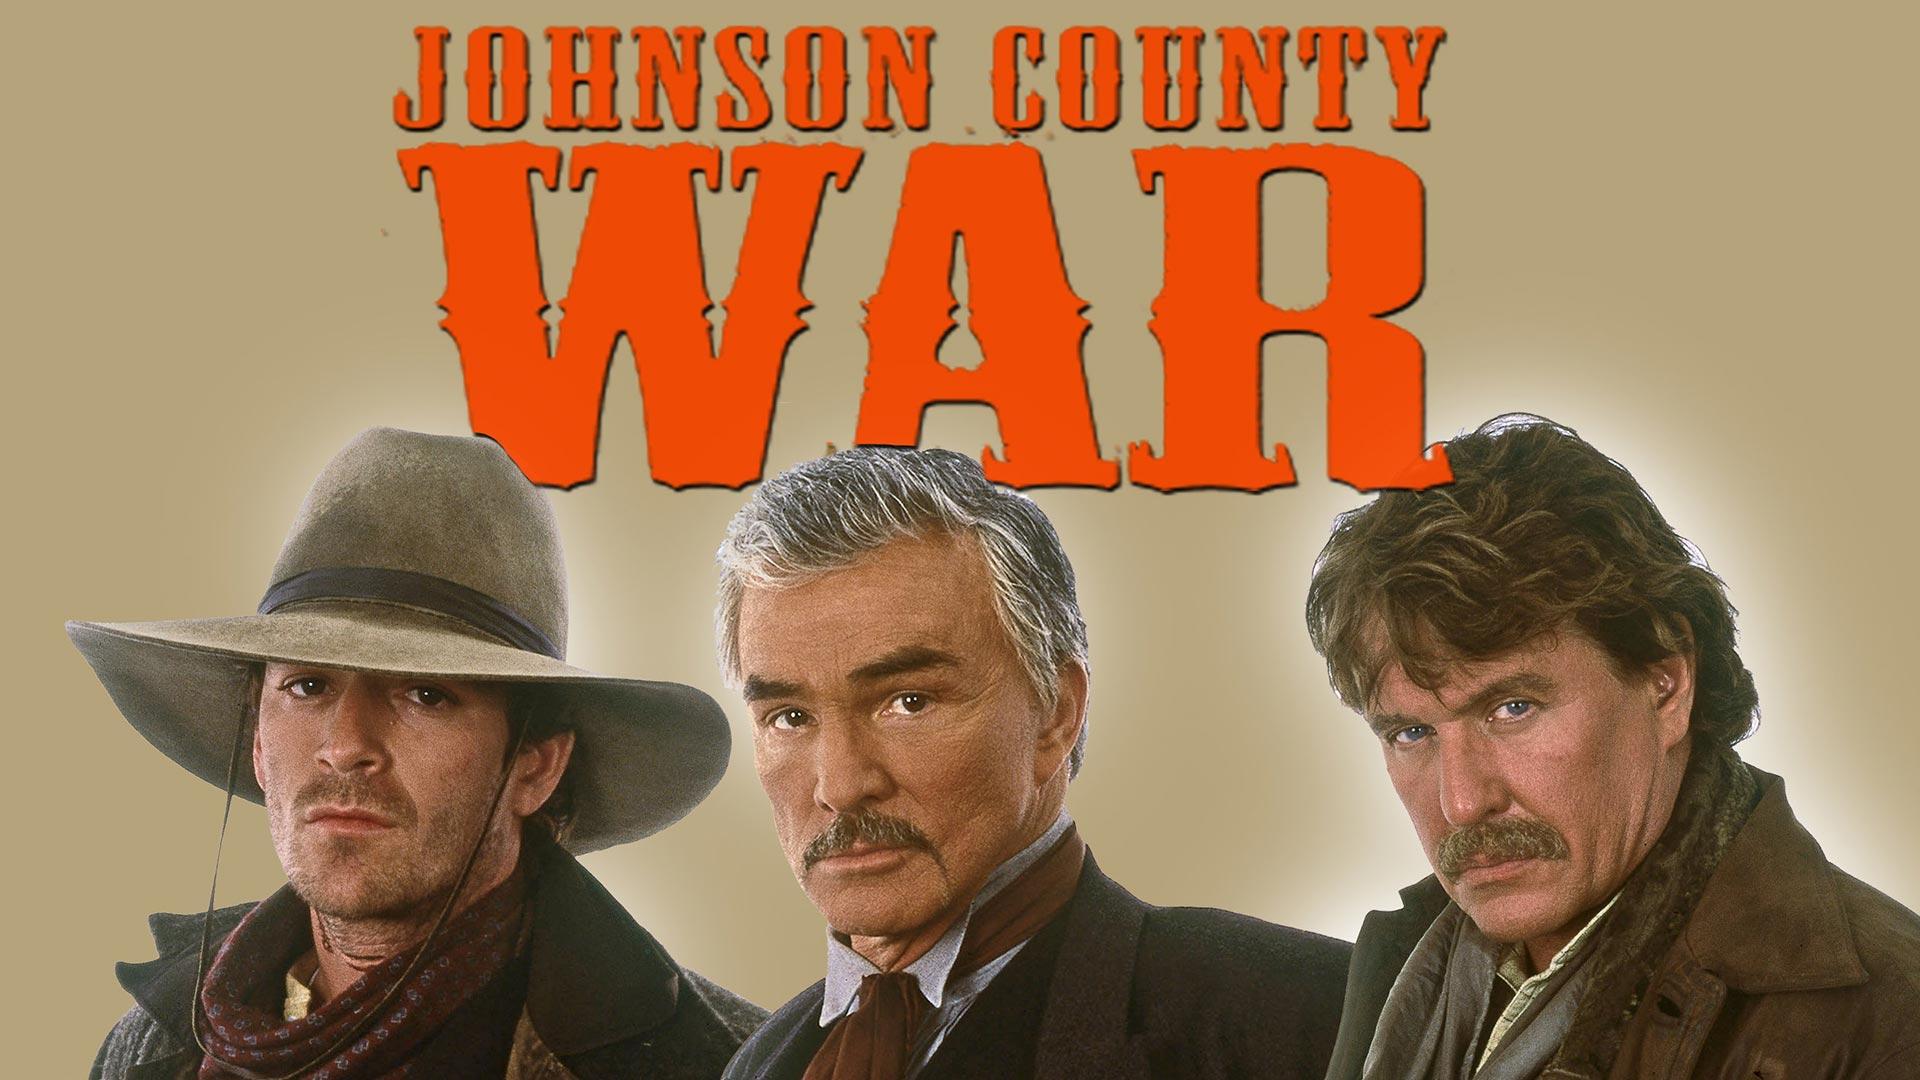 Johnson County War - The Complete Miniseries Season 1